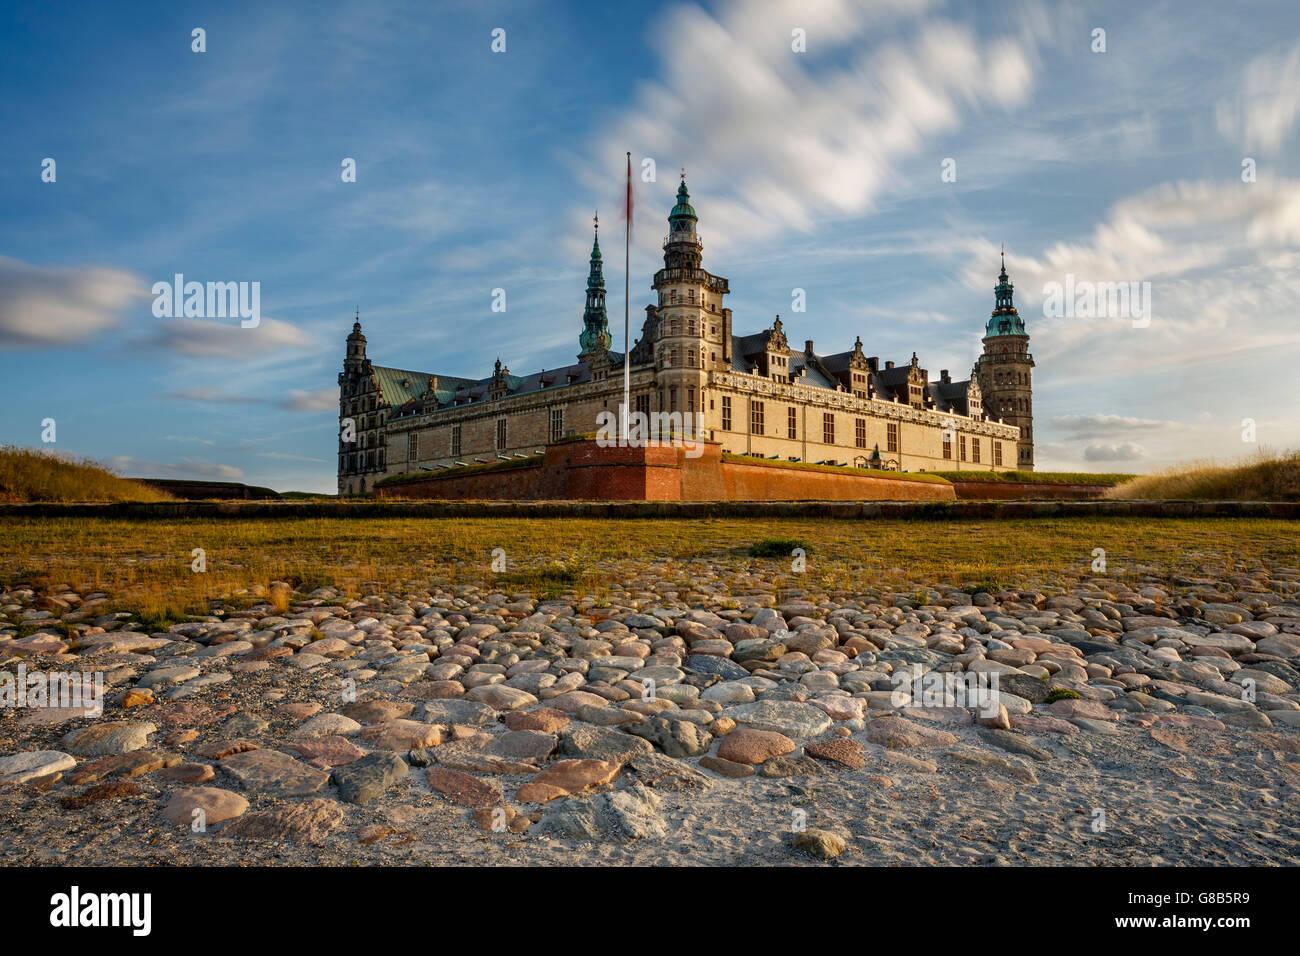 Schloss Kronborg in Helsingør, Dänemark bei Dämmerung gesehen. Das Schloss wurde hinzugefügt, Stockbild